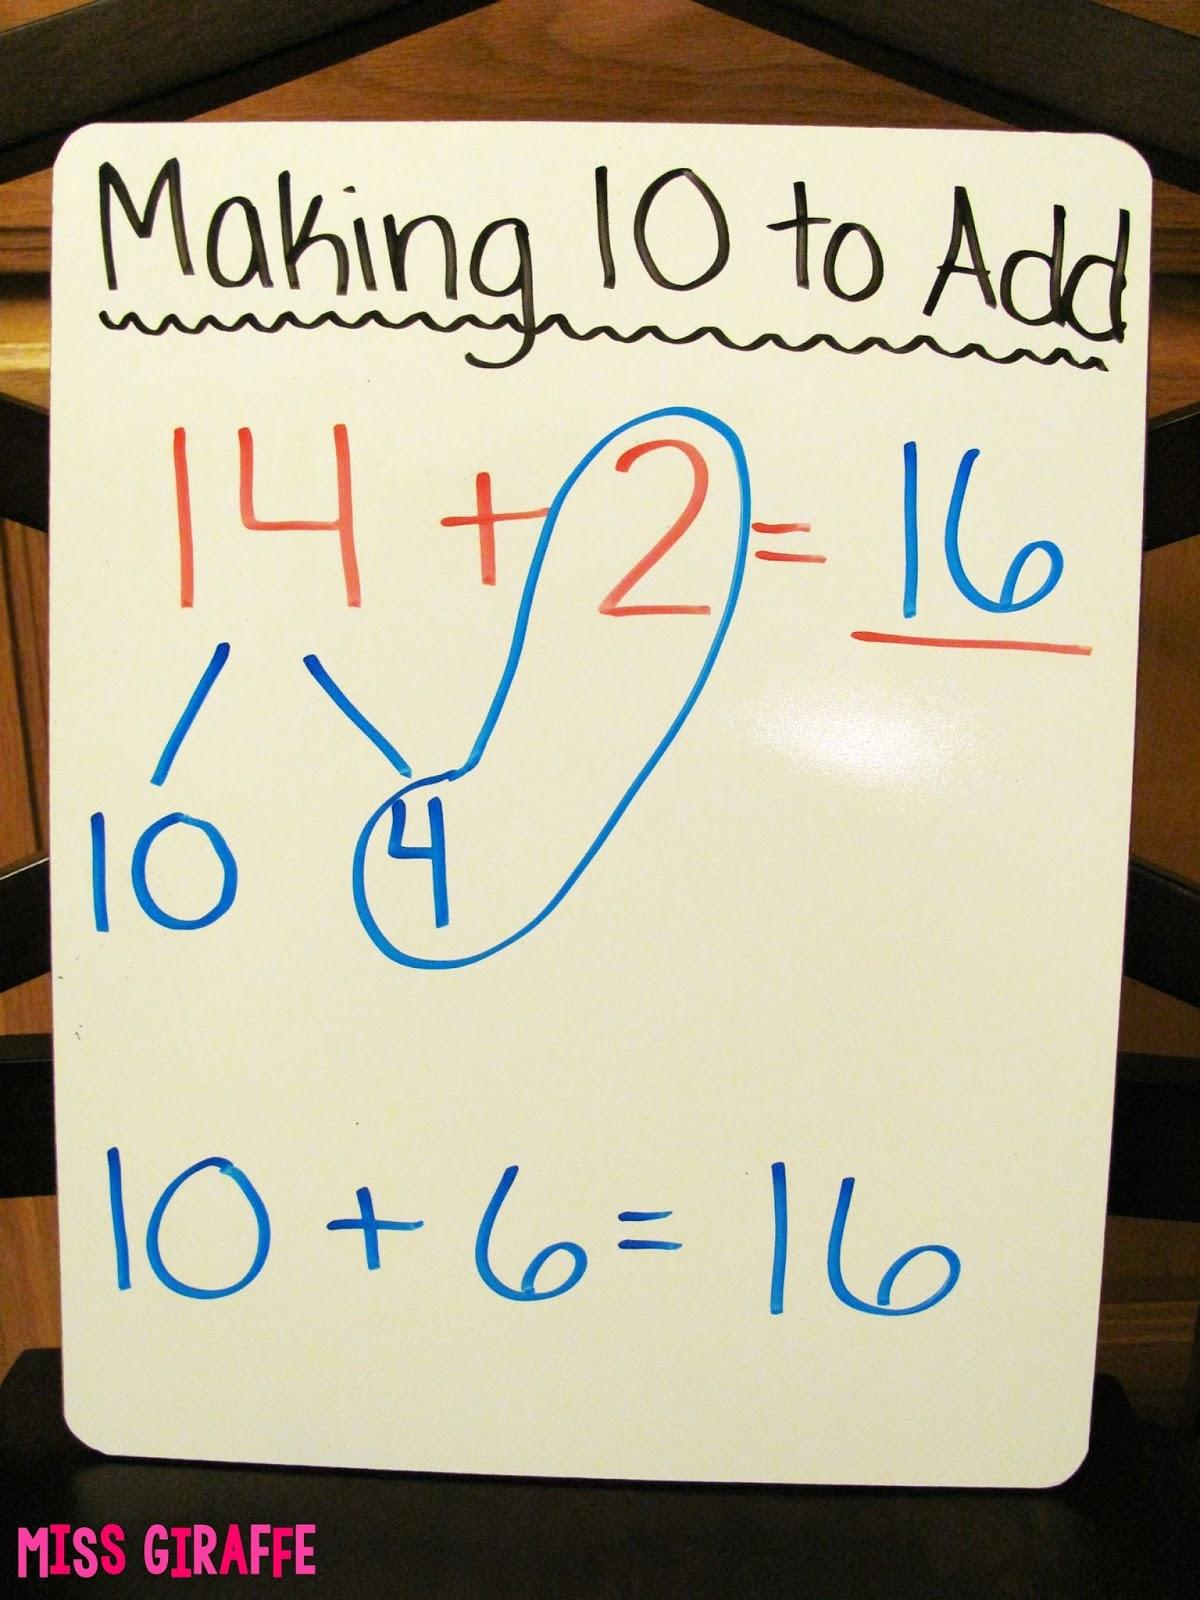 Miss Giraffe S Class Making A 10 To Add